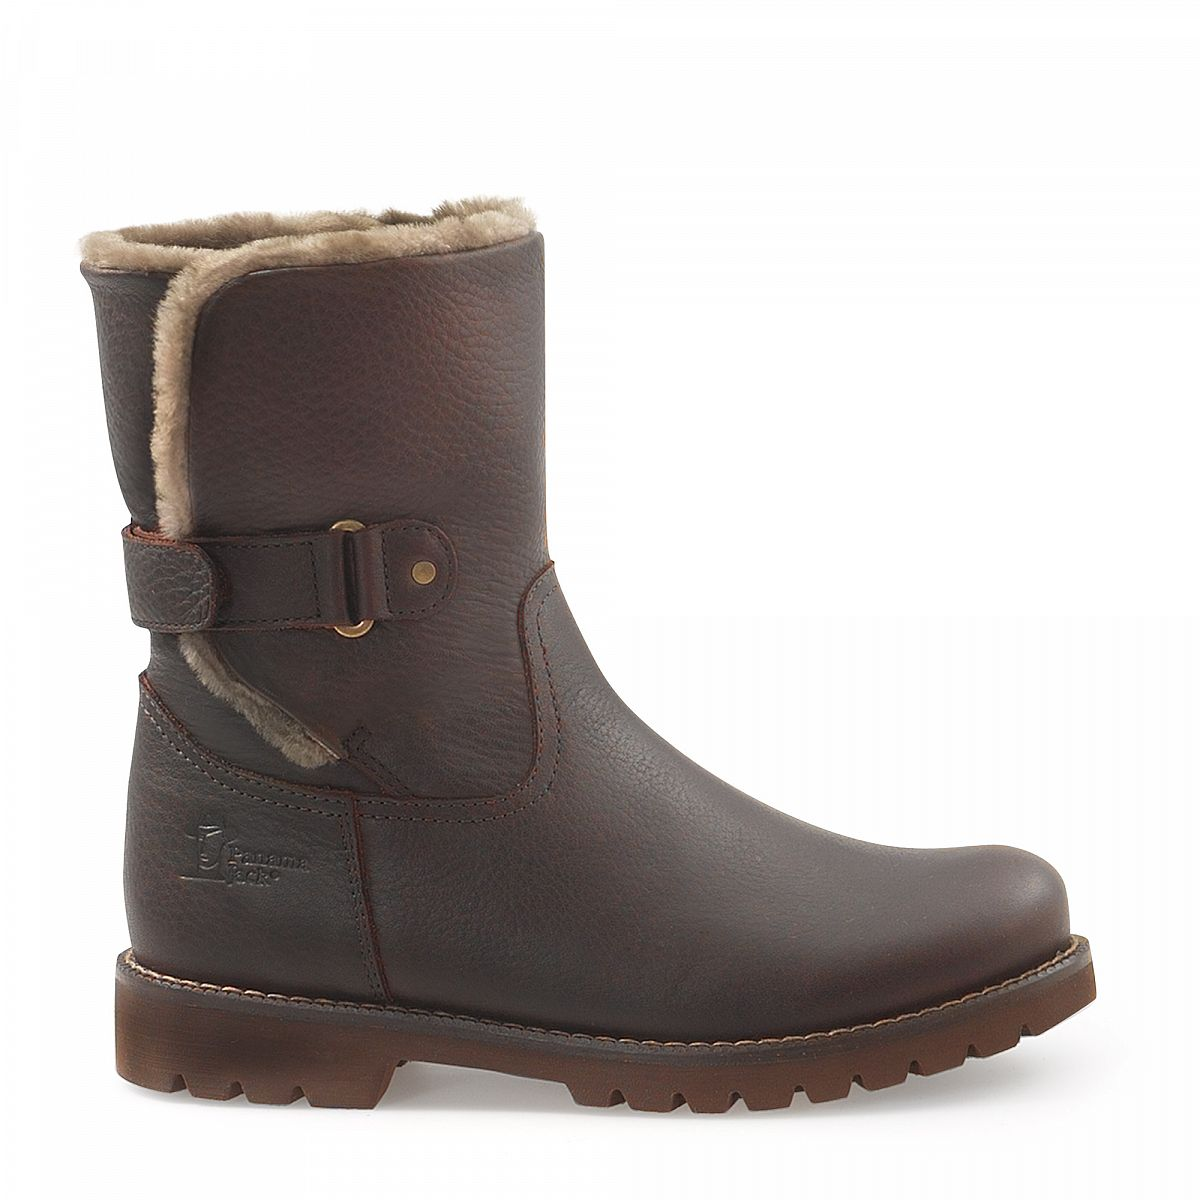 women s boot felia igloo brown panama jack official. Black Bedroom Furniture Sets. Home Design Ideas